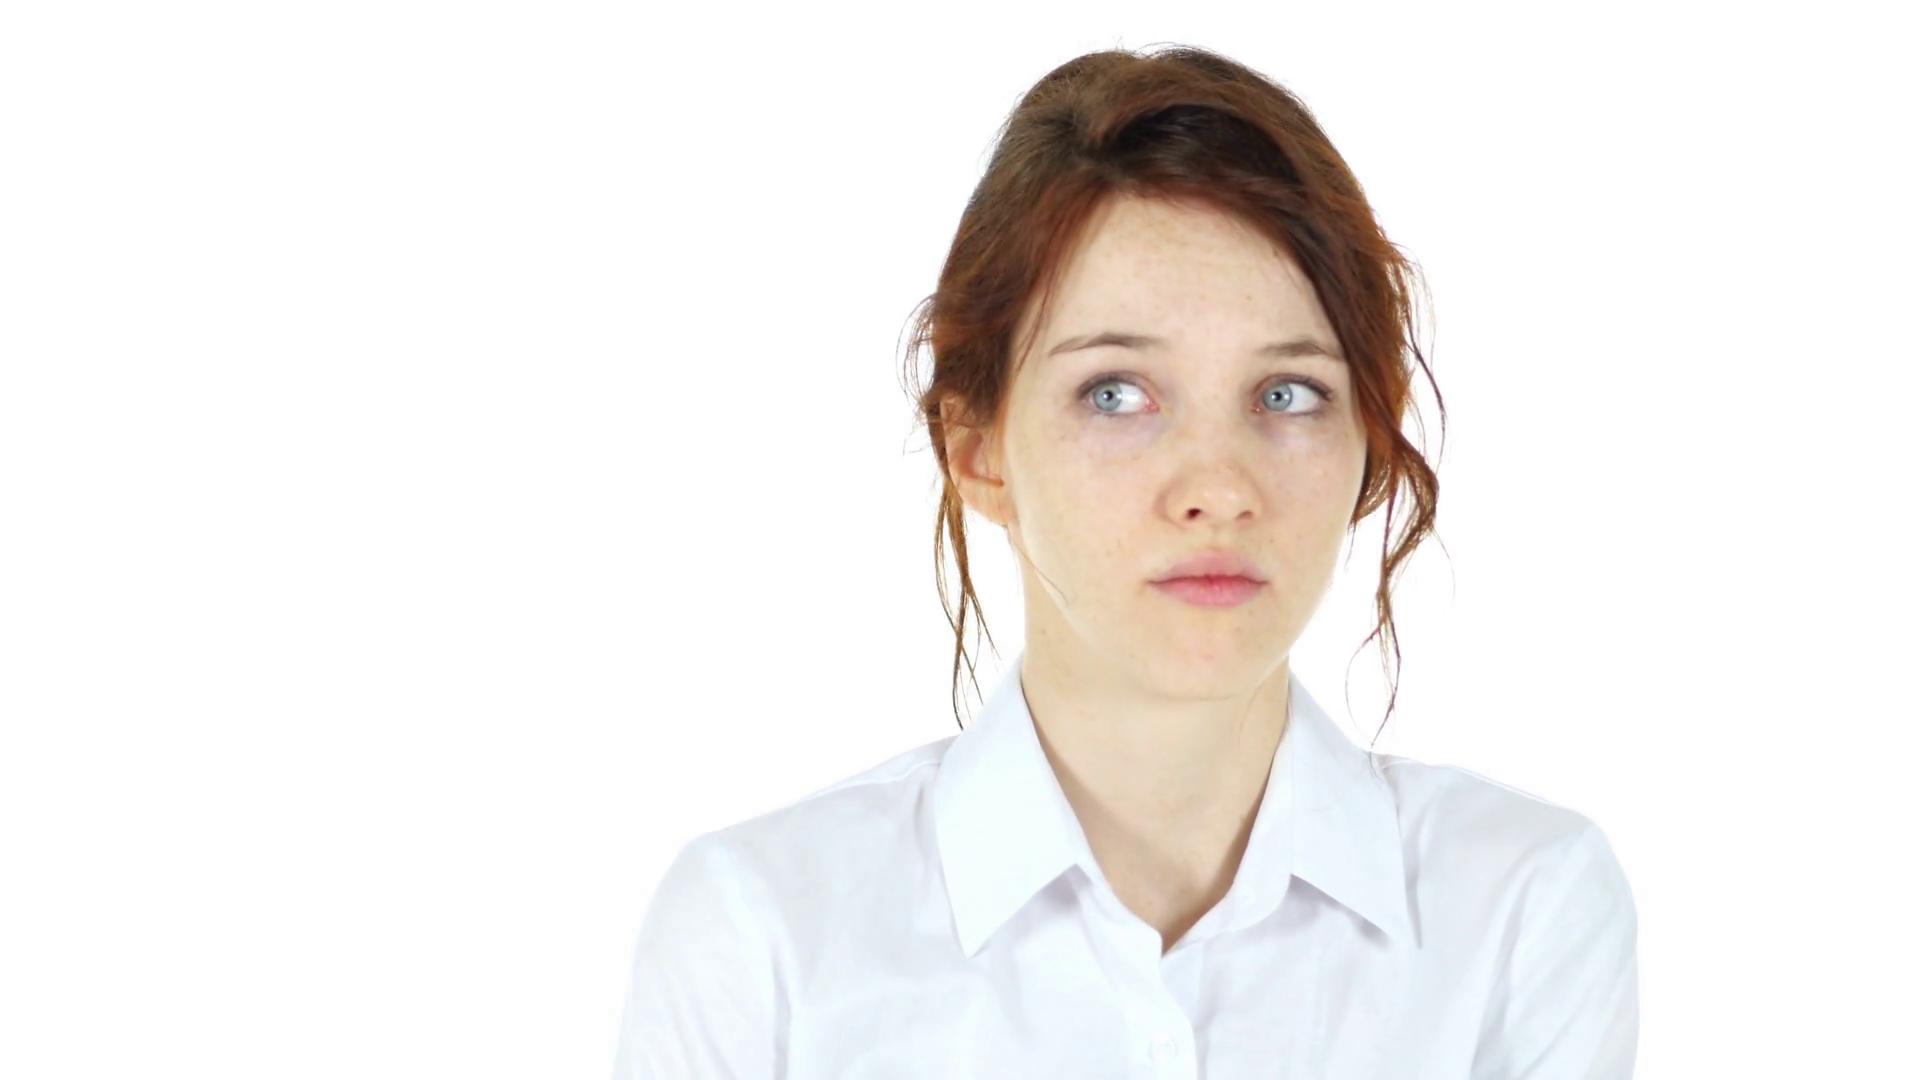 Afraid Worried Woman, White Background Stock Video Footage - Videoblocks